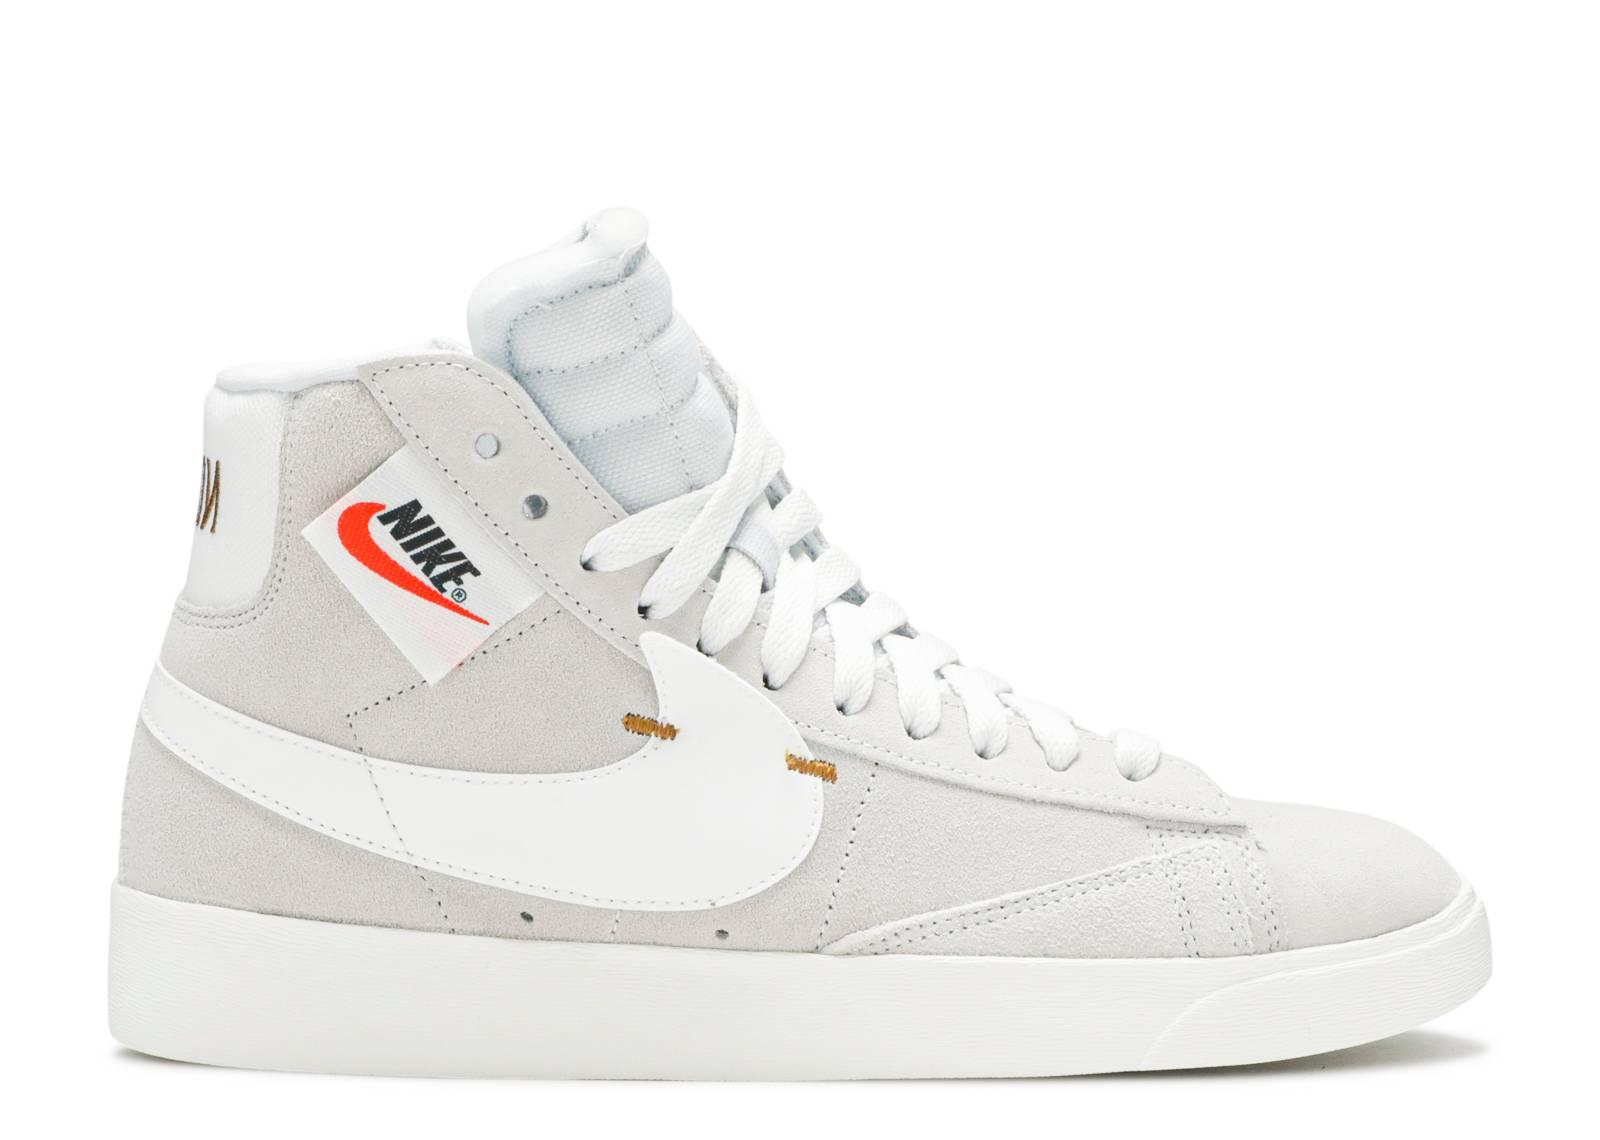 W Blazer Mid Rebel - Nike - bq4022 101 - off white/summit white ...